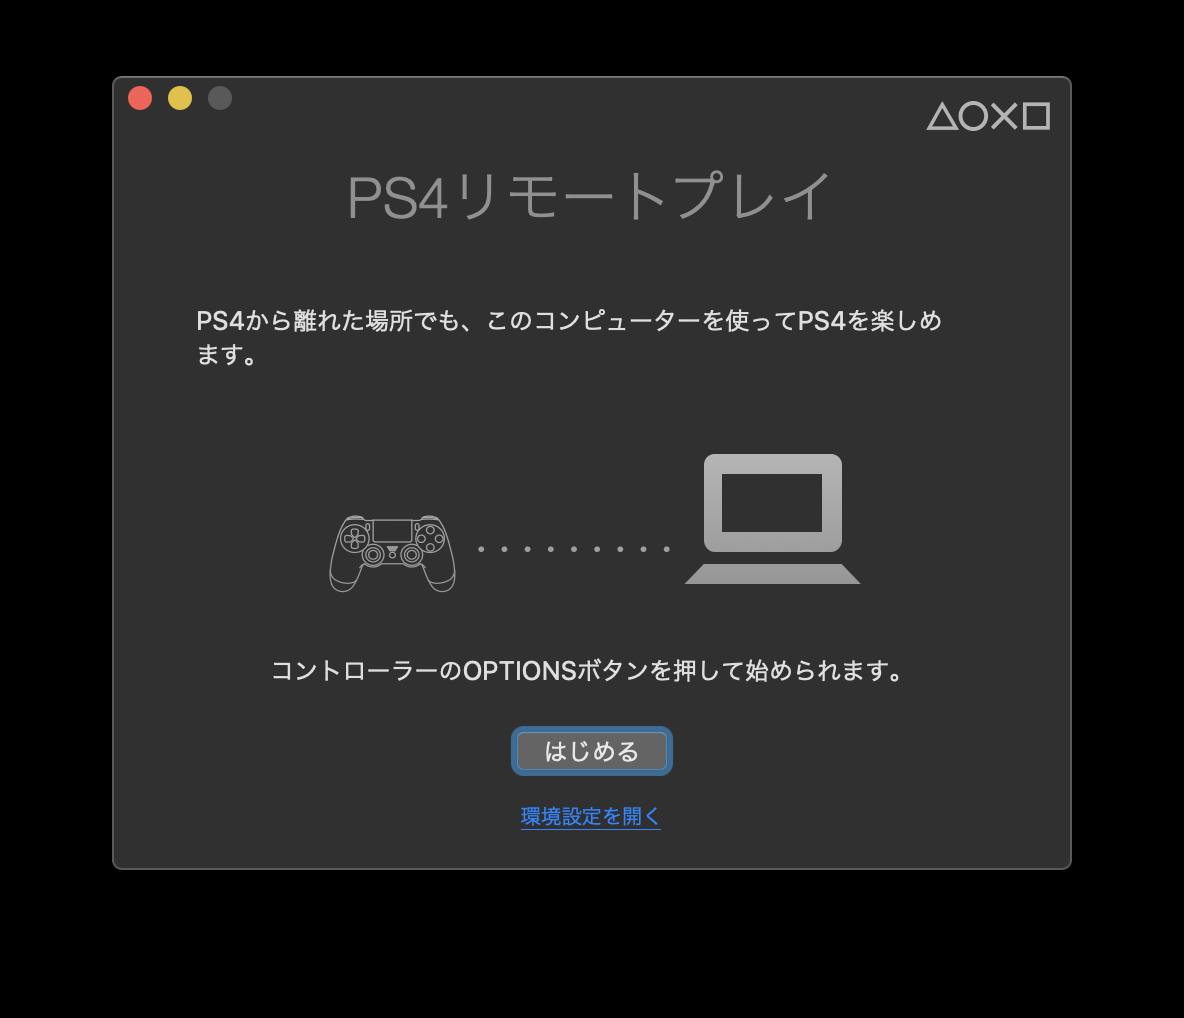 f:id:rinsuki:20191017003625p:plain